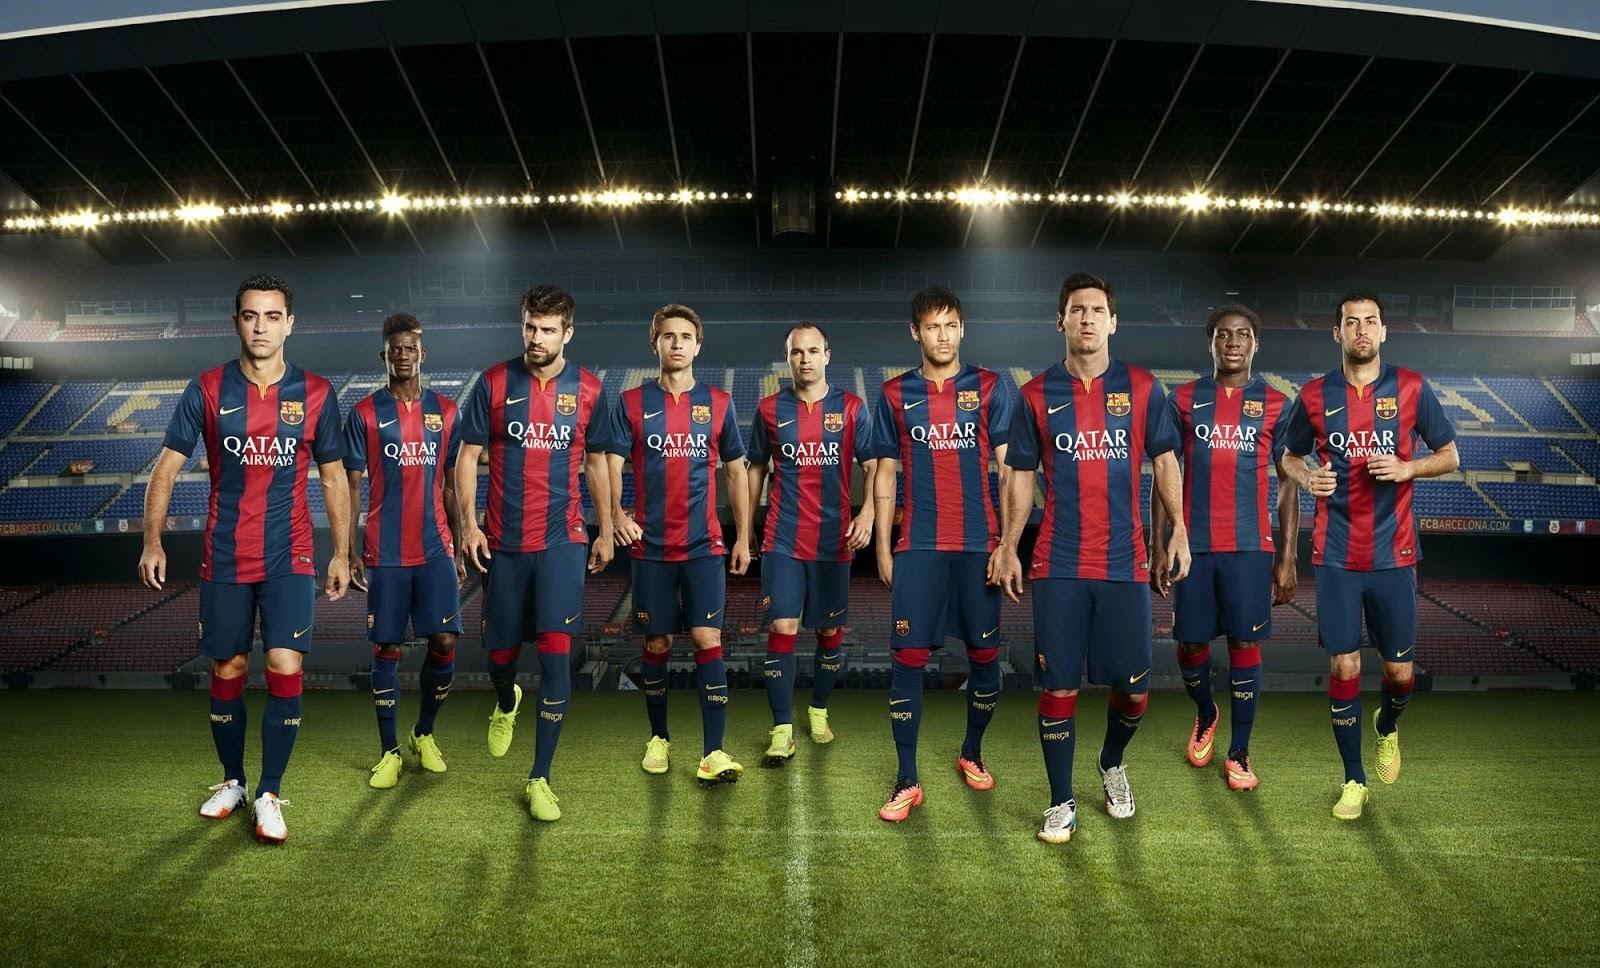 FC Barcelona 2014-15 Home Kit